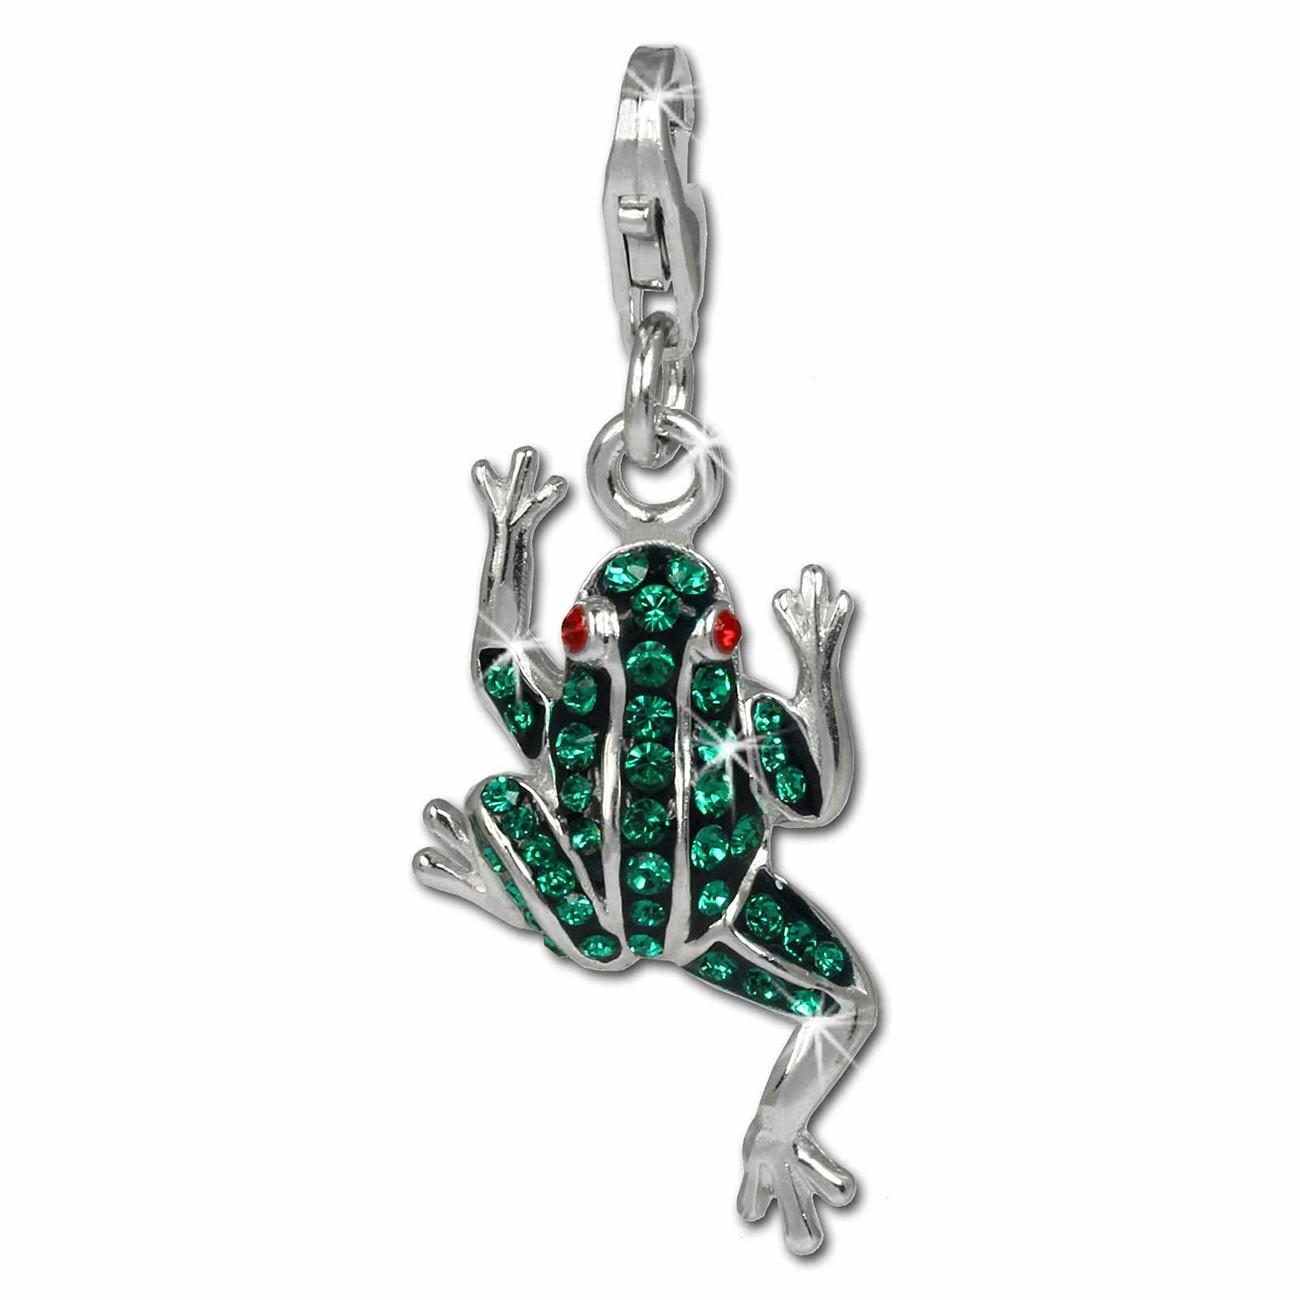 SilberDream Glitzer Charm Frosch grün Zirkonia Kristalle 925er GSC521G